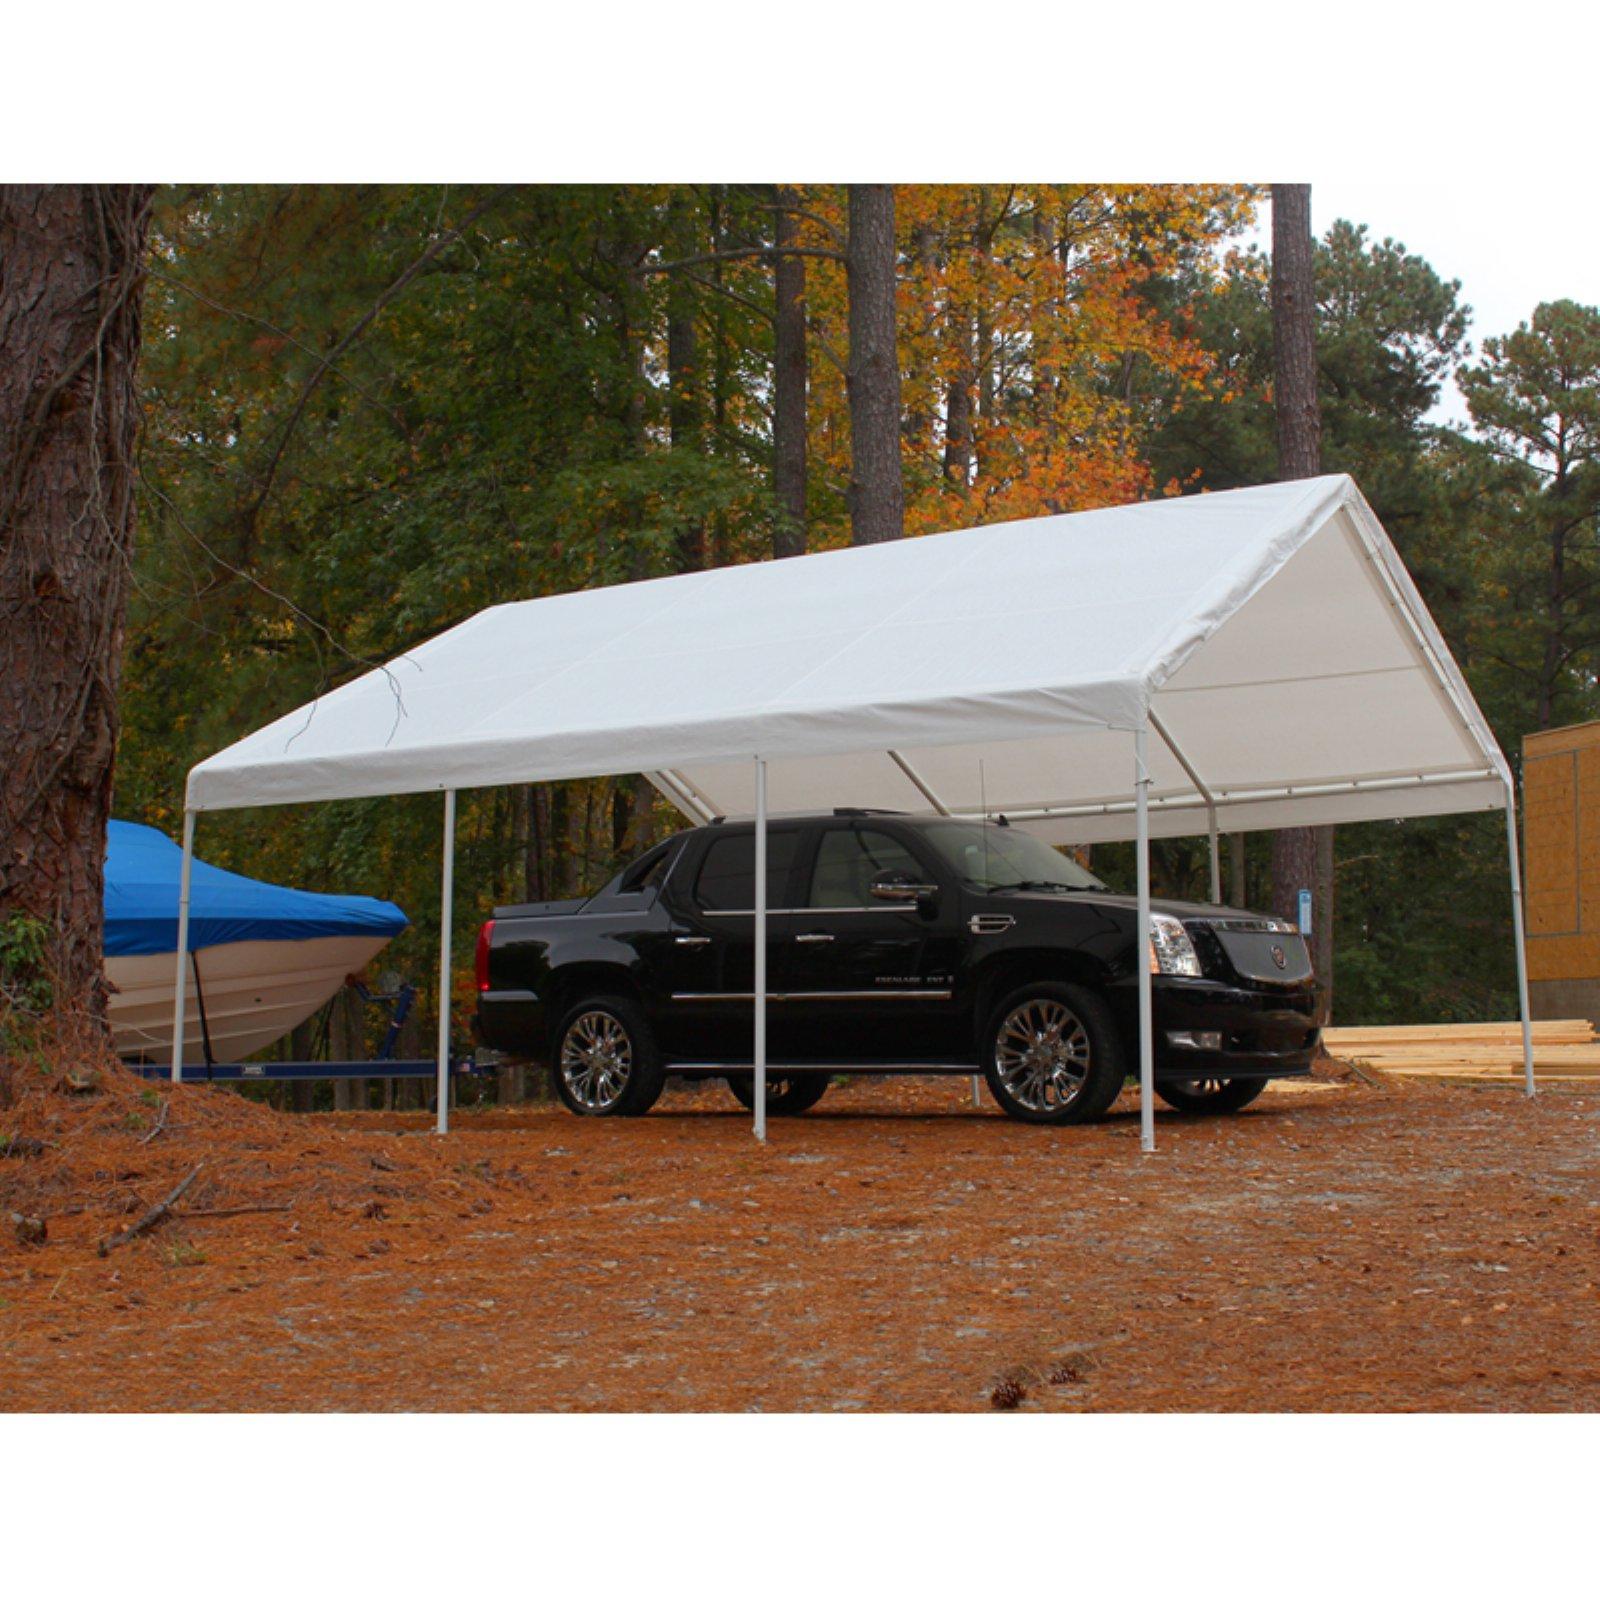 carport tent king canopy hercules canopy carport - 18 x 20 ft. ANRXSBY